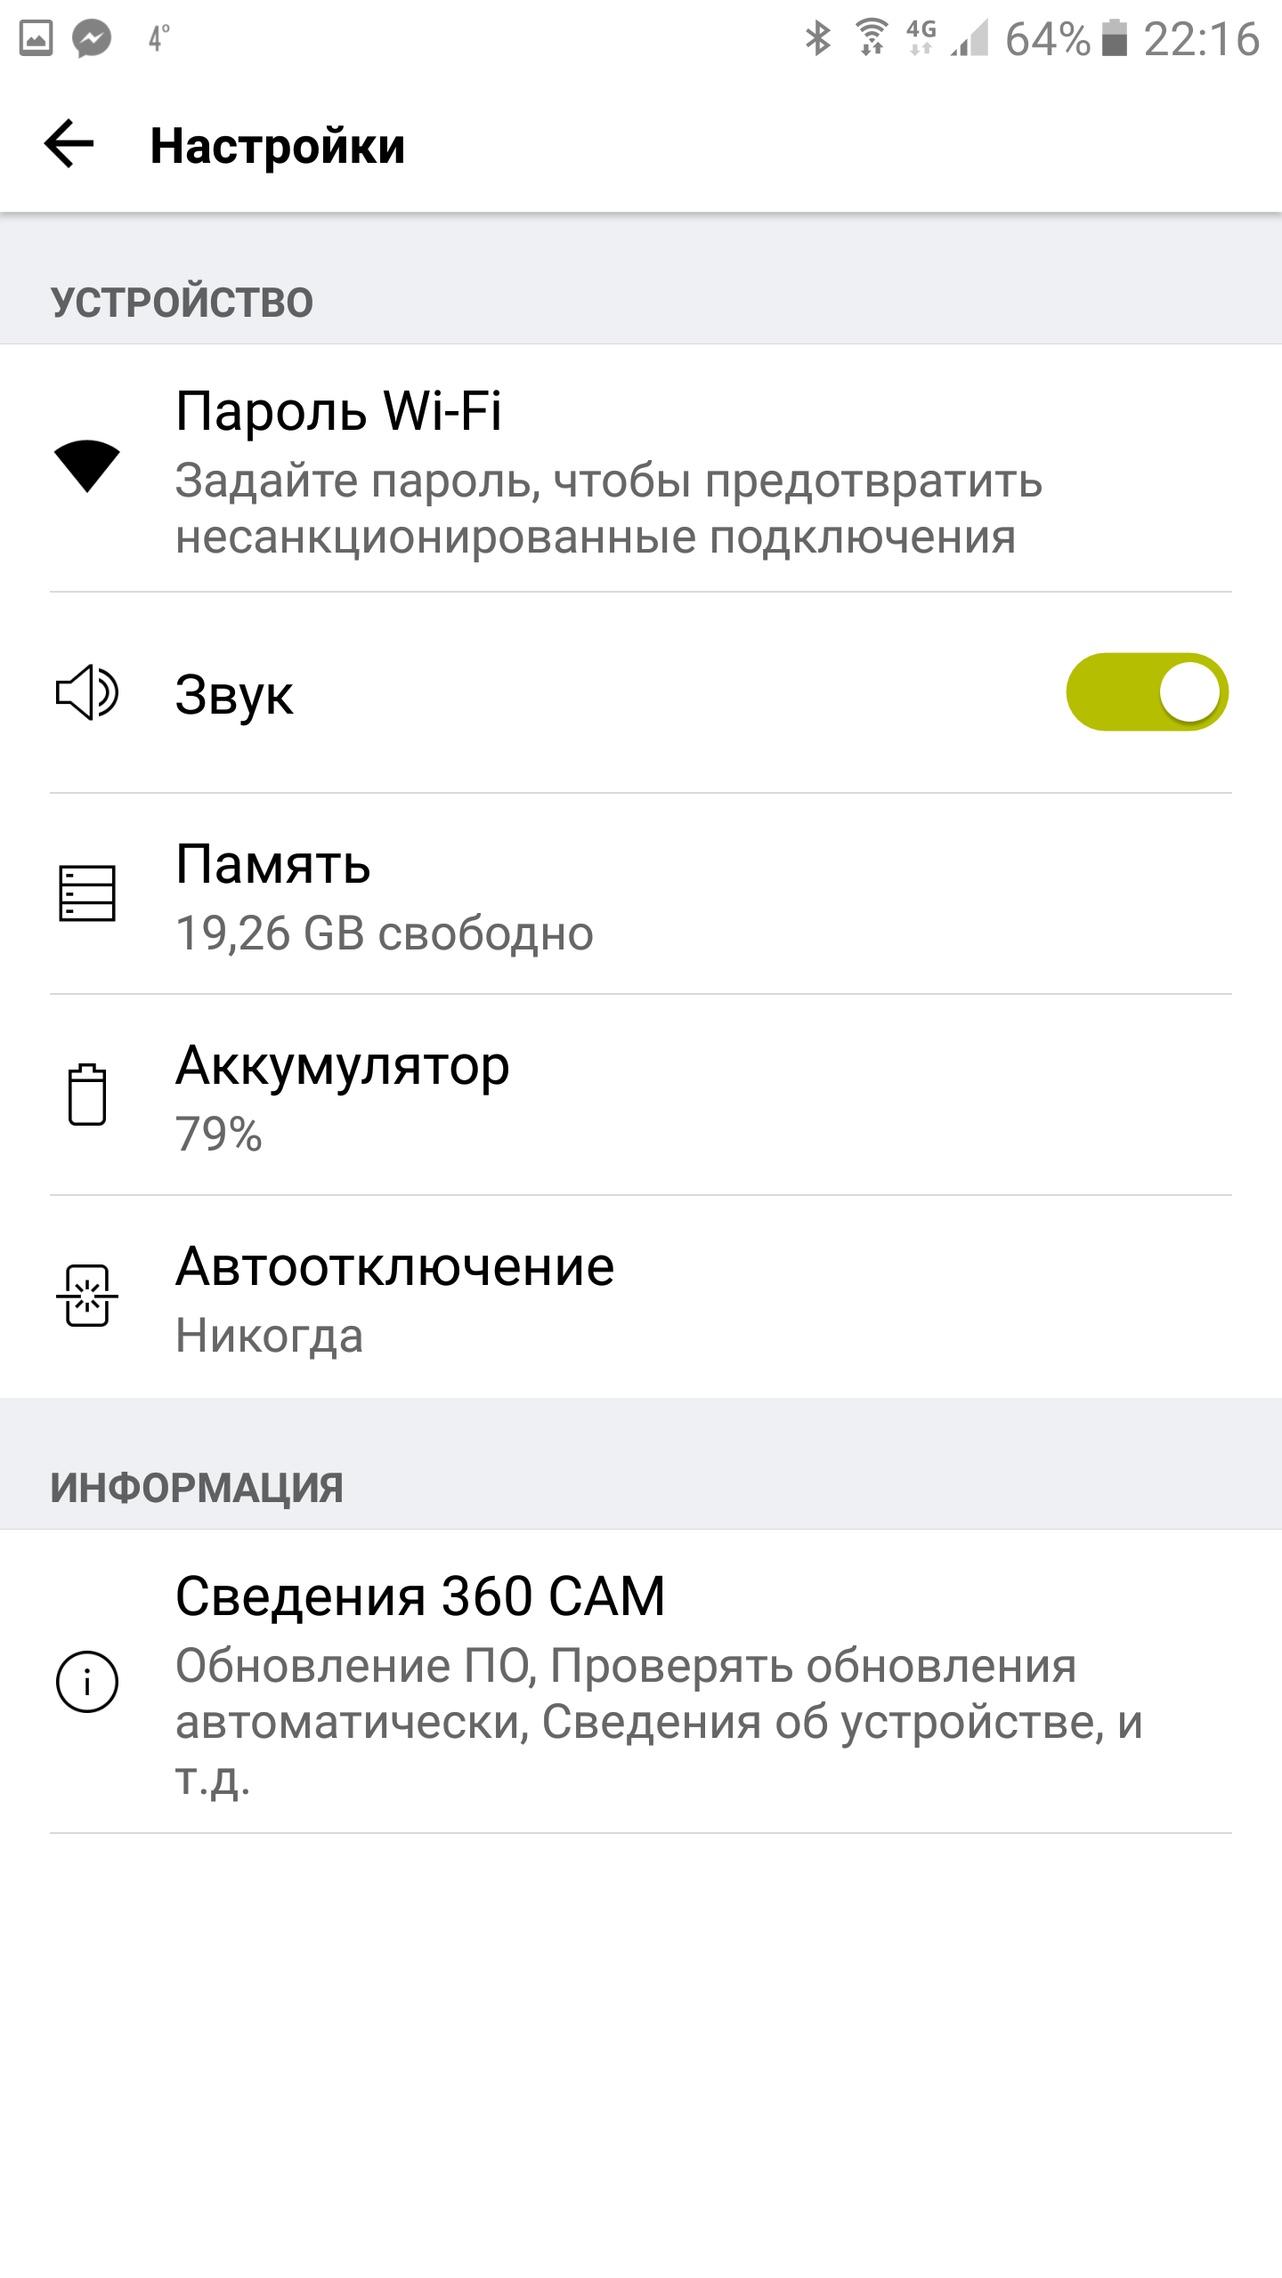 LG CAM 360 manager